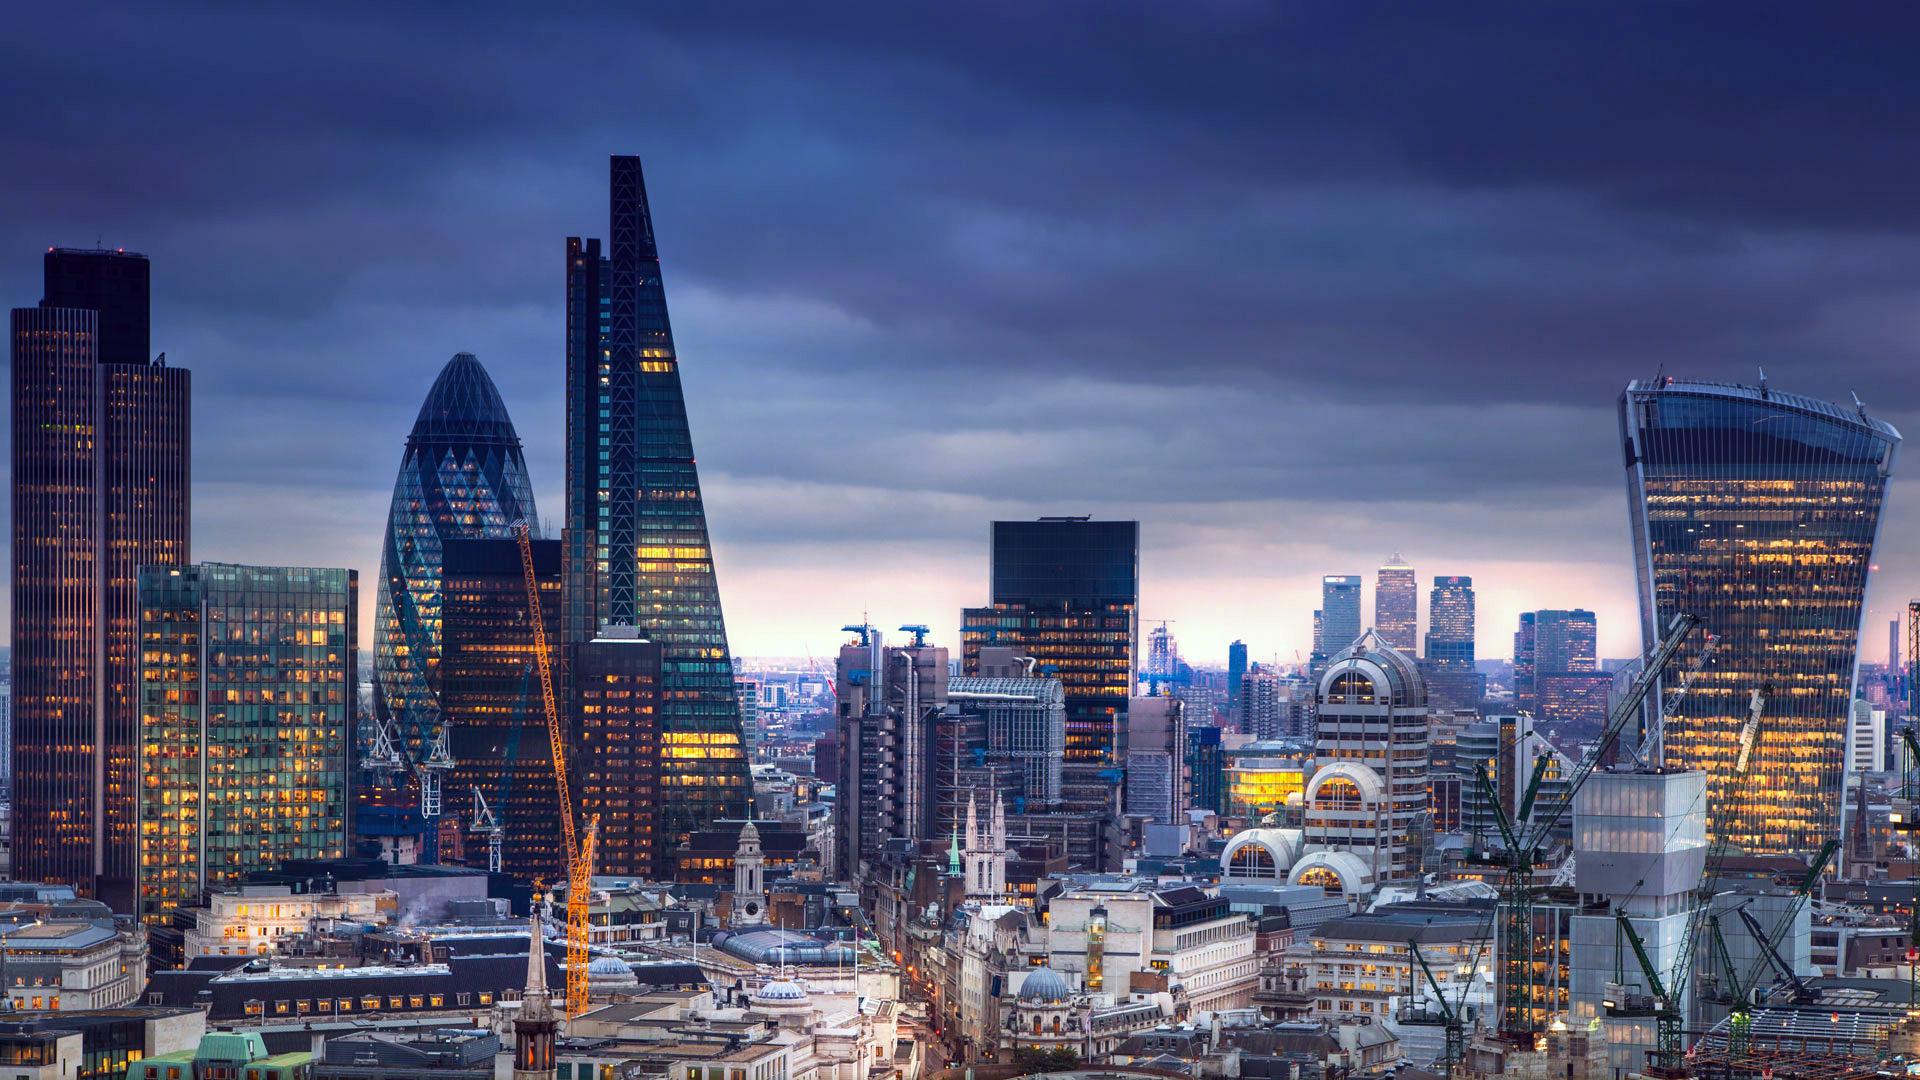 Africonomie_Africa Alternative Investment Intensive_London Forum_Banner.jpg